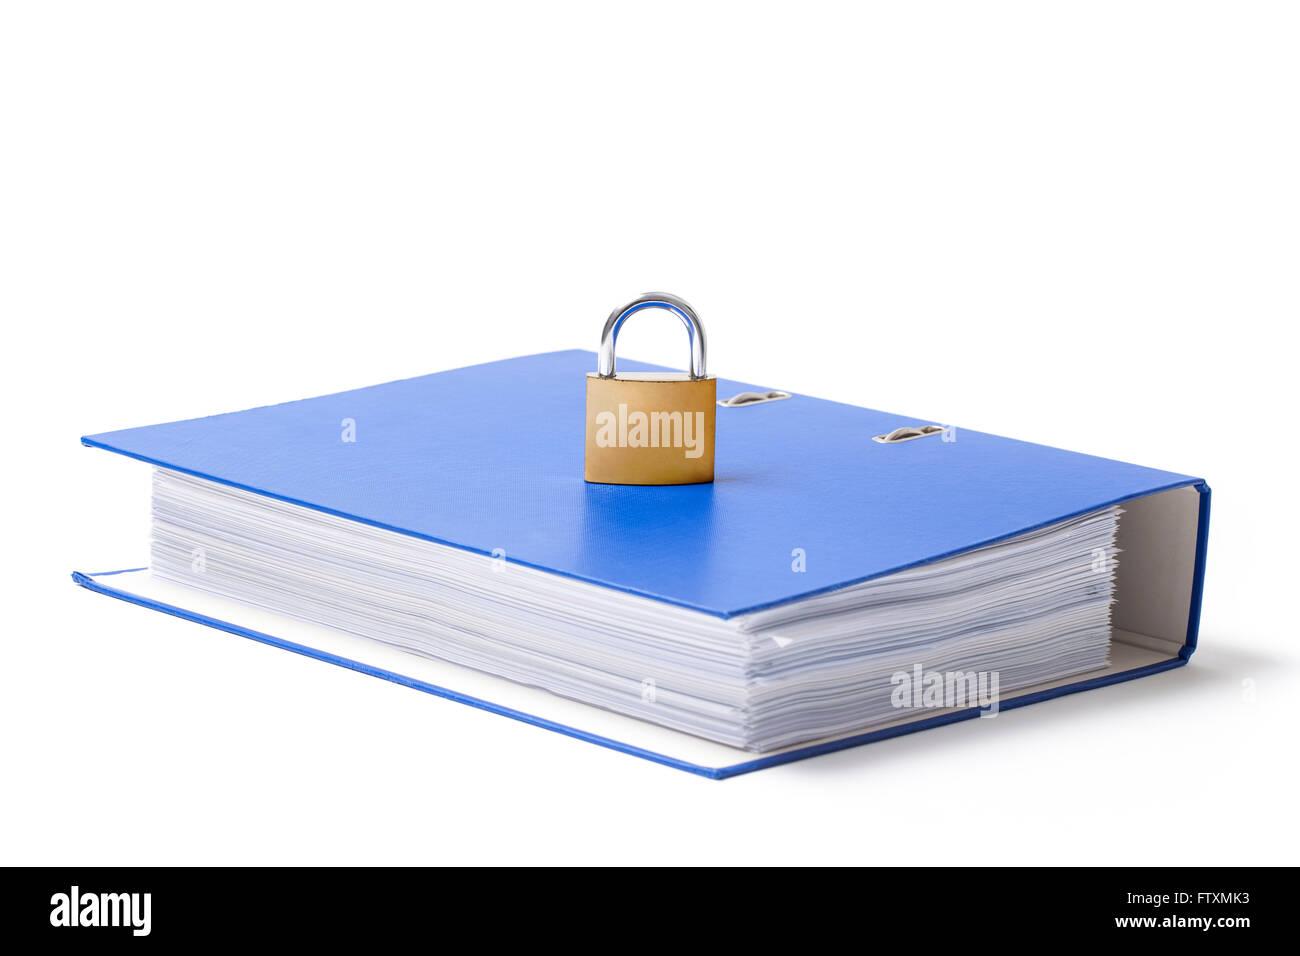 Locked metal padlock put on a blue carton folder on white background. - Stock Image